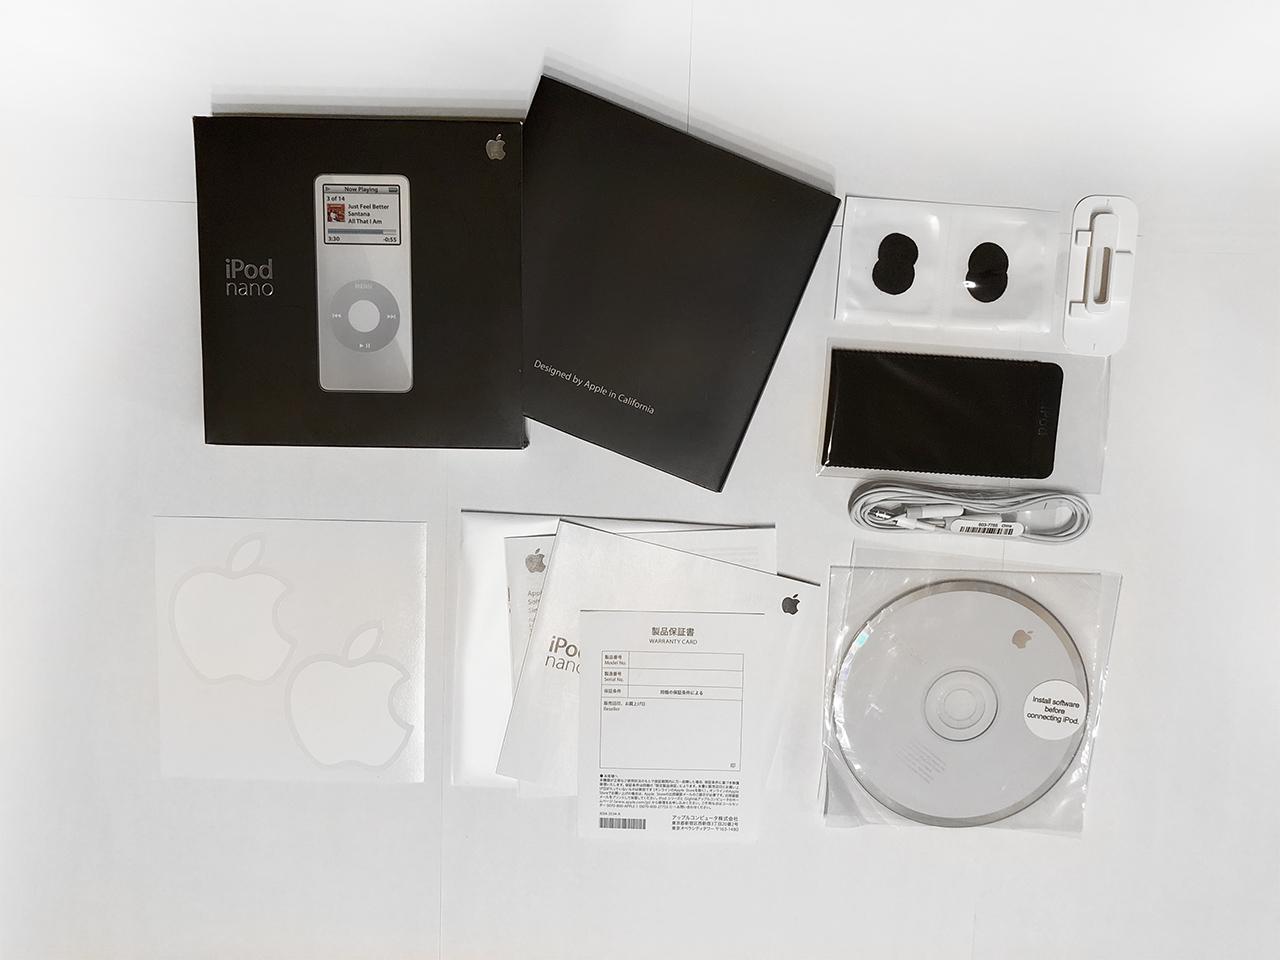 iPod Nanoの空箱